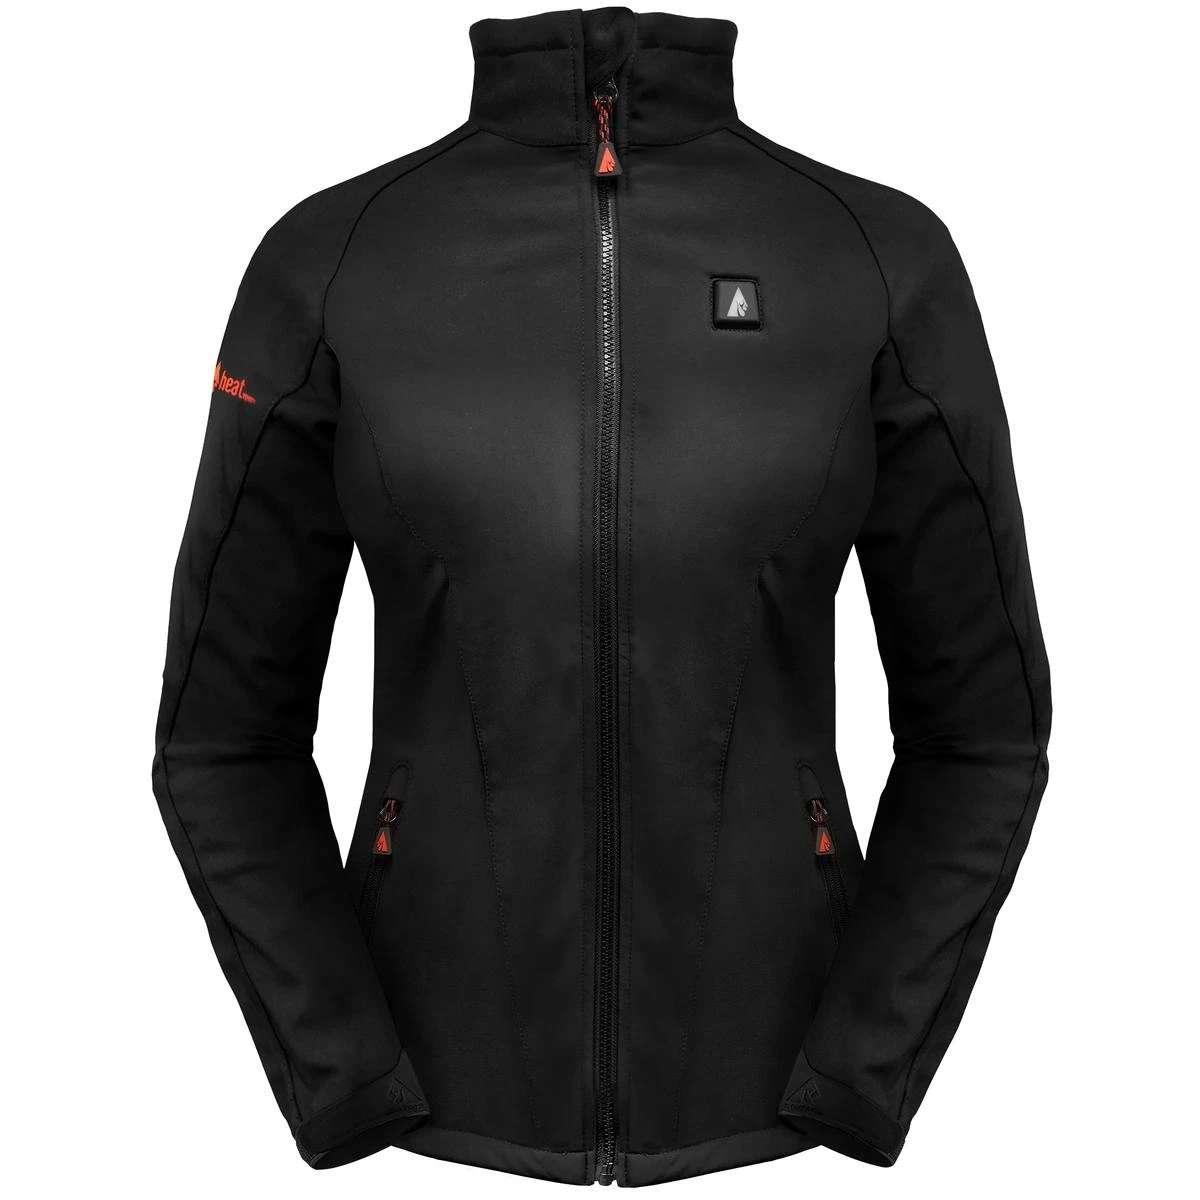 ActionHeat 5V Battery Heated Jacket – Women's